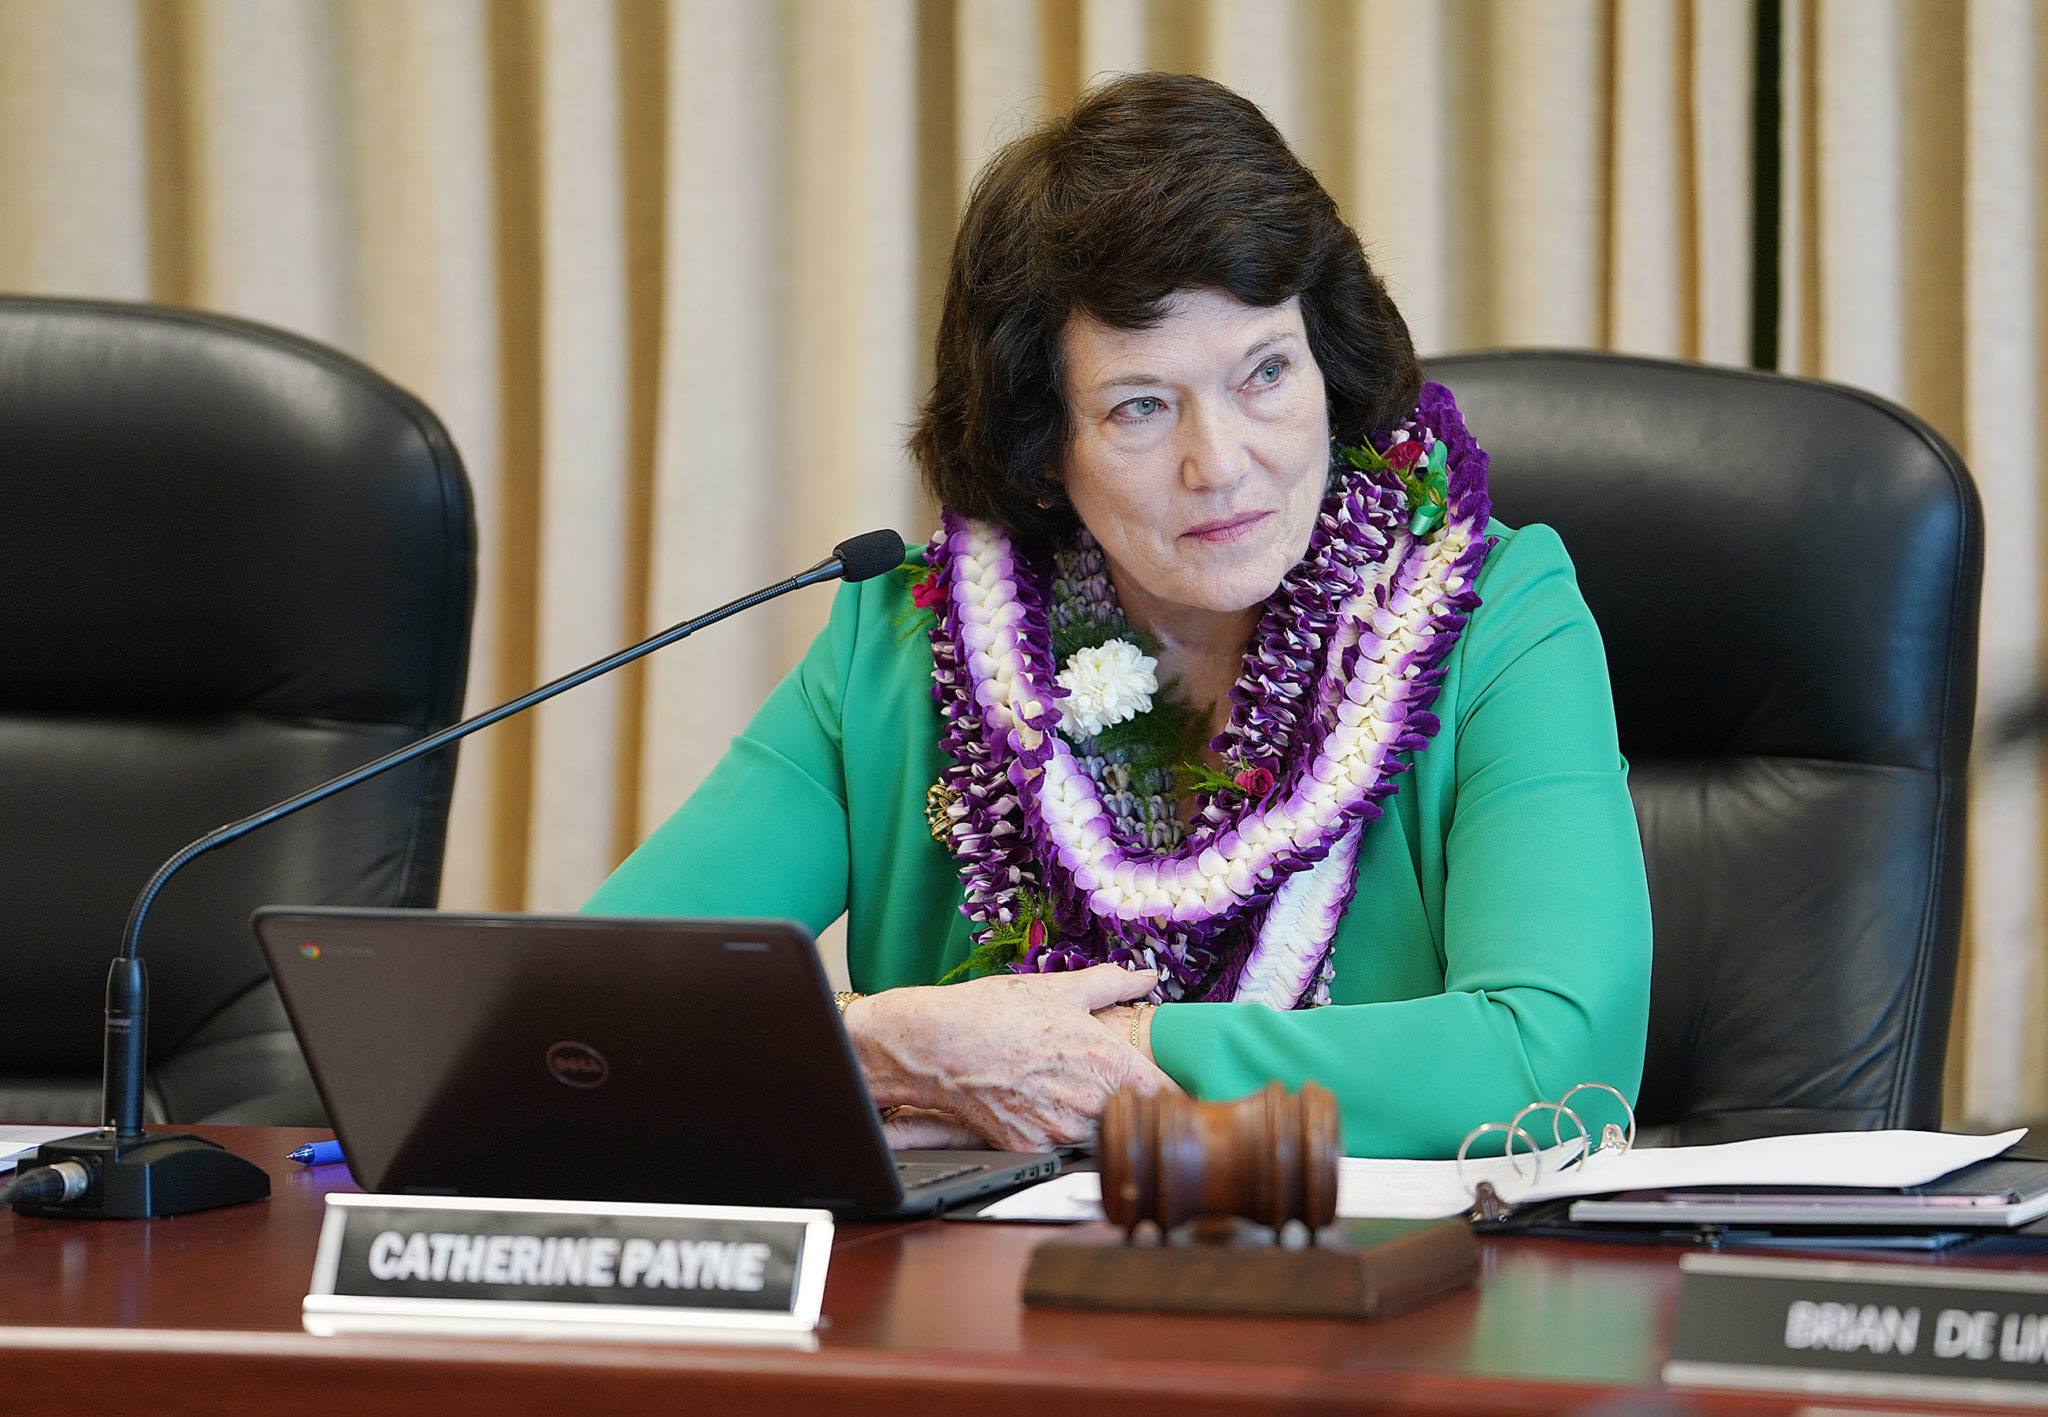 Board of Education Catherine Payne.